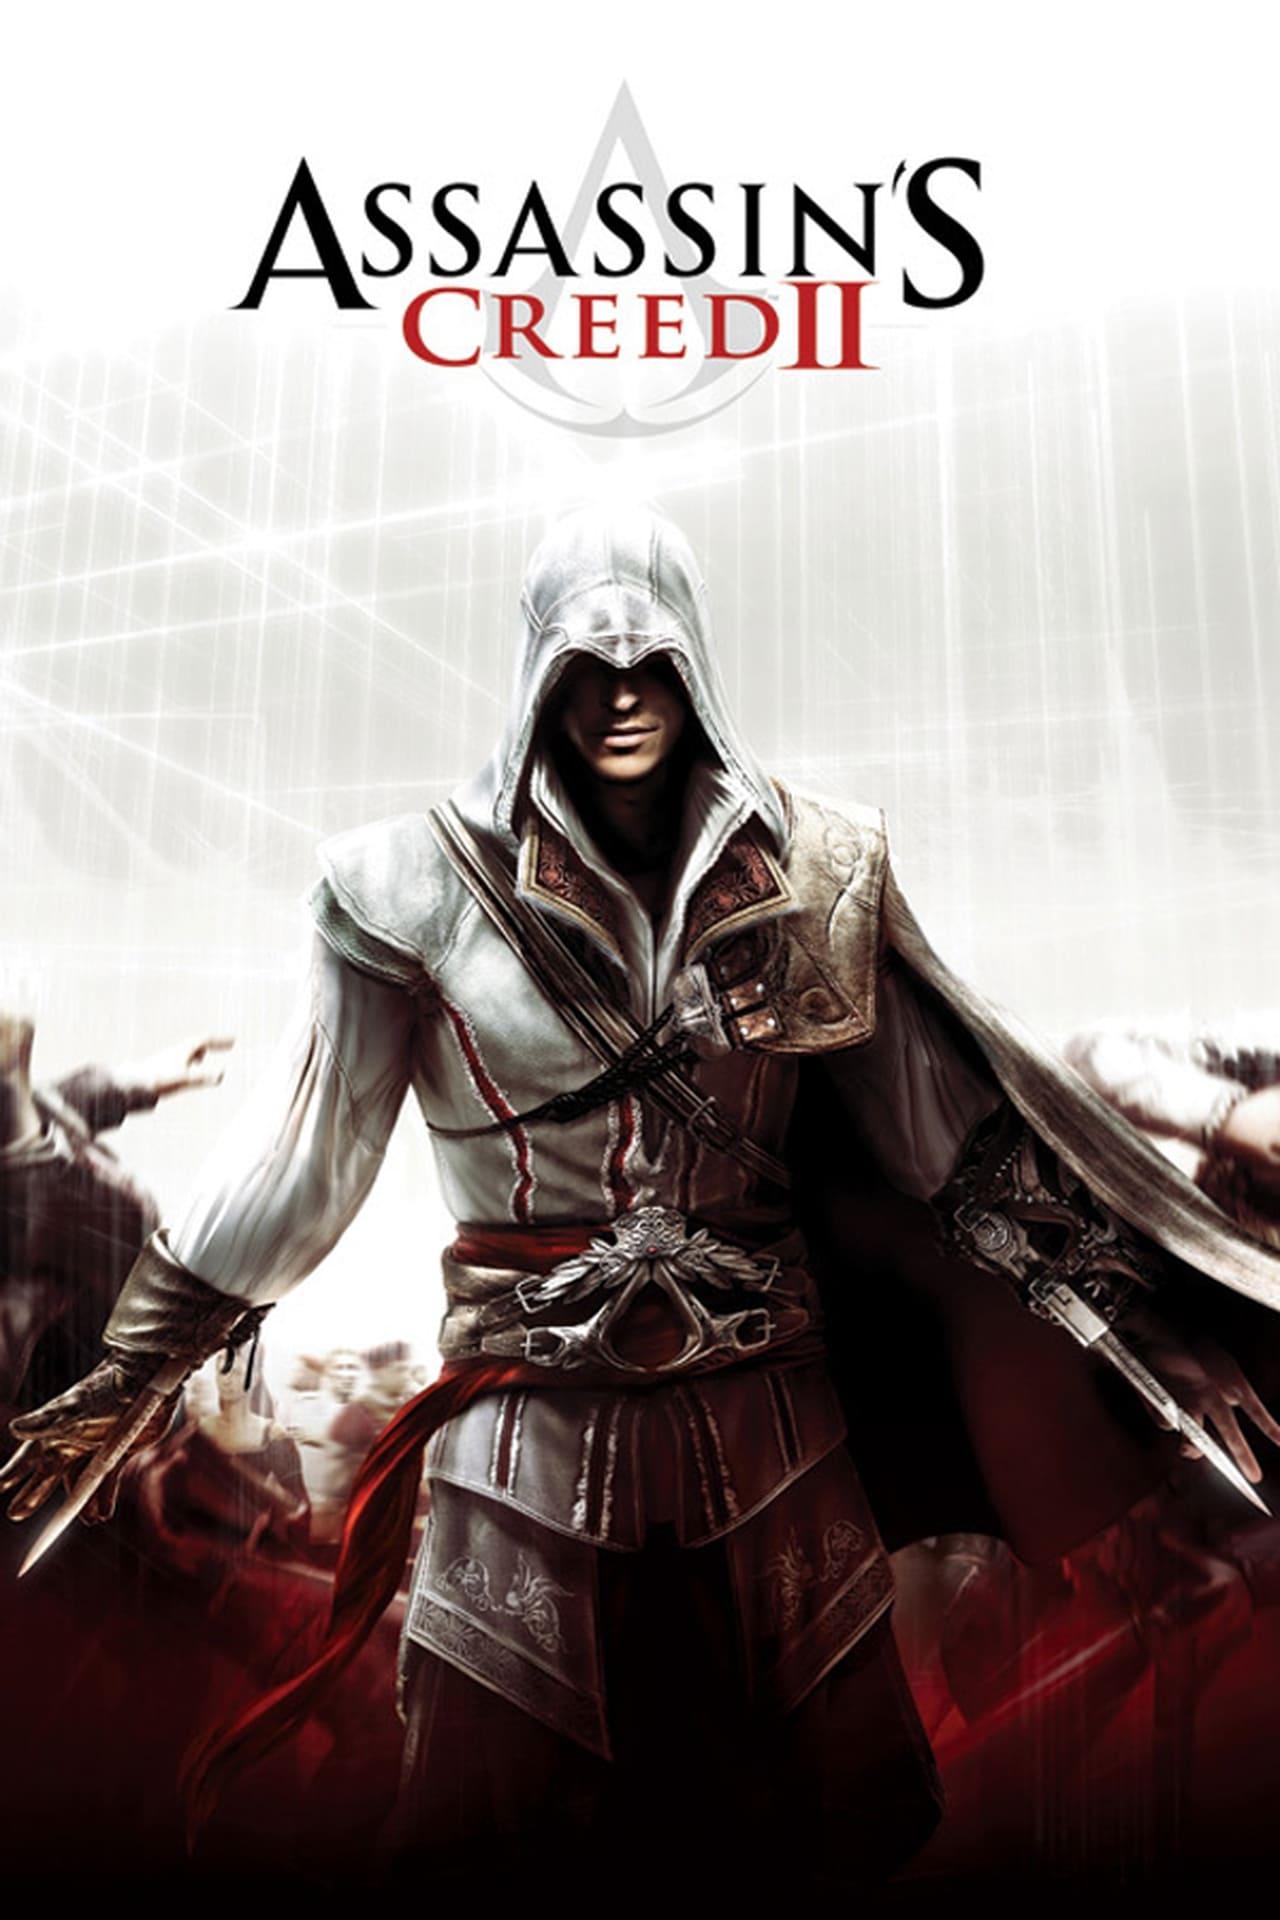 Assassin S Creed Ii Istitlou 3 Istitlou War Ar Marc Had Opensubtit